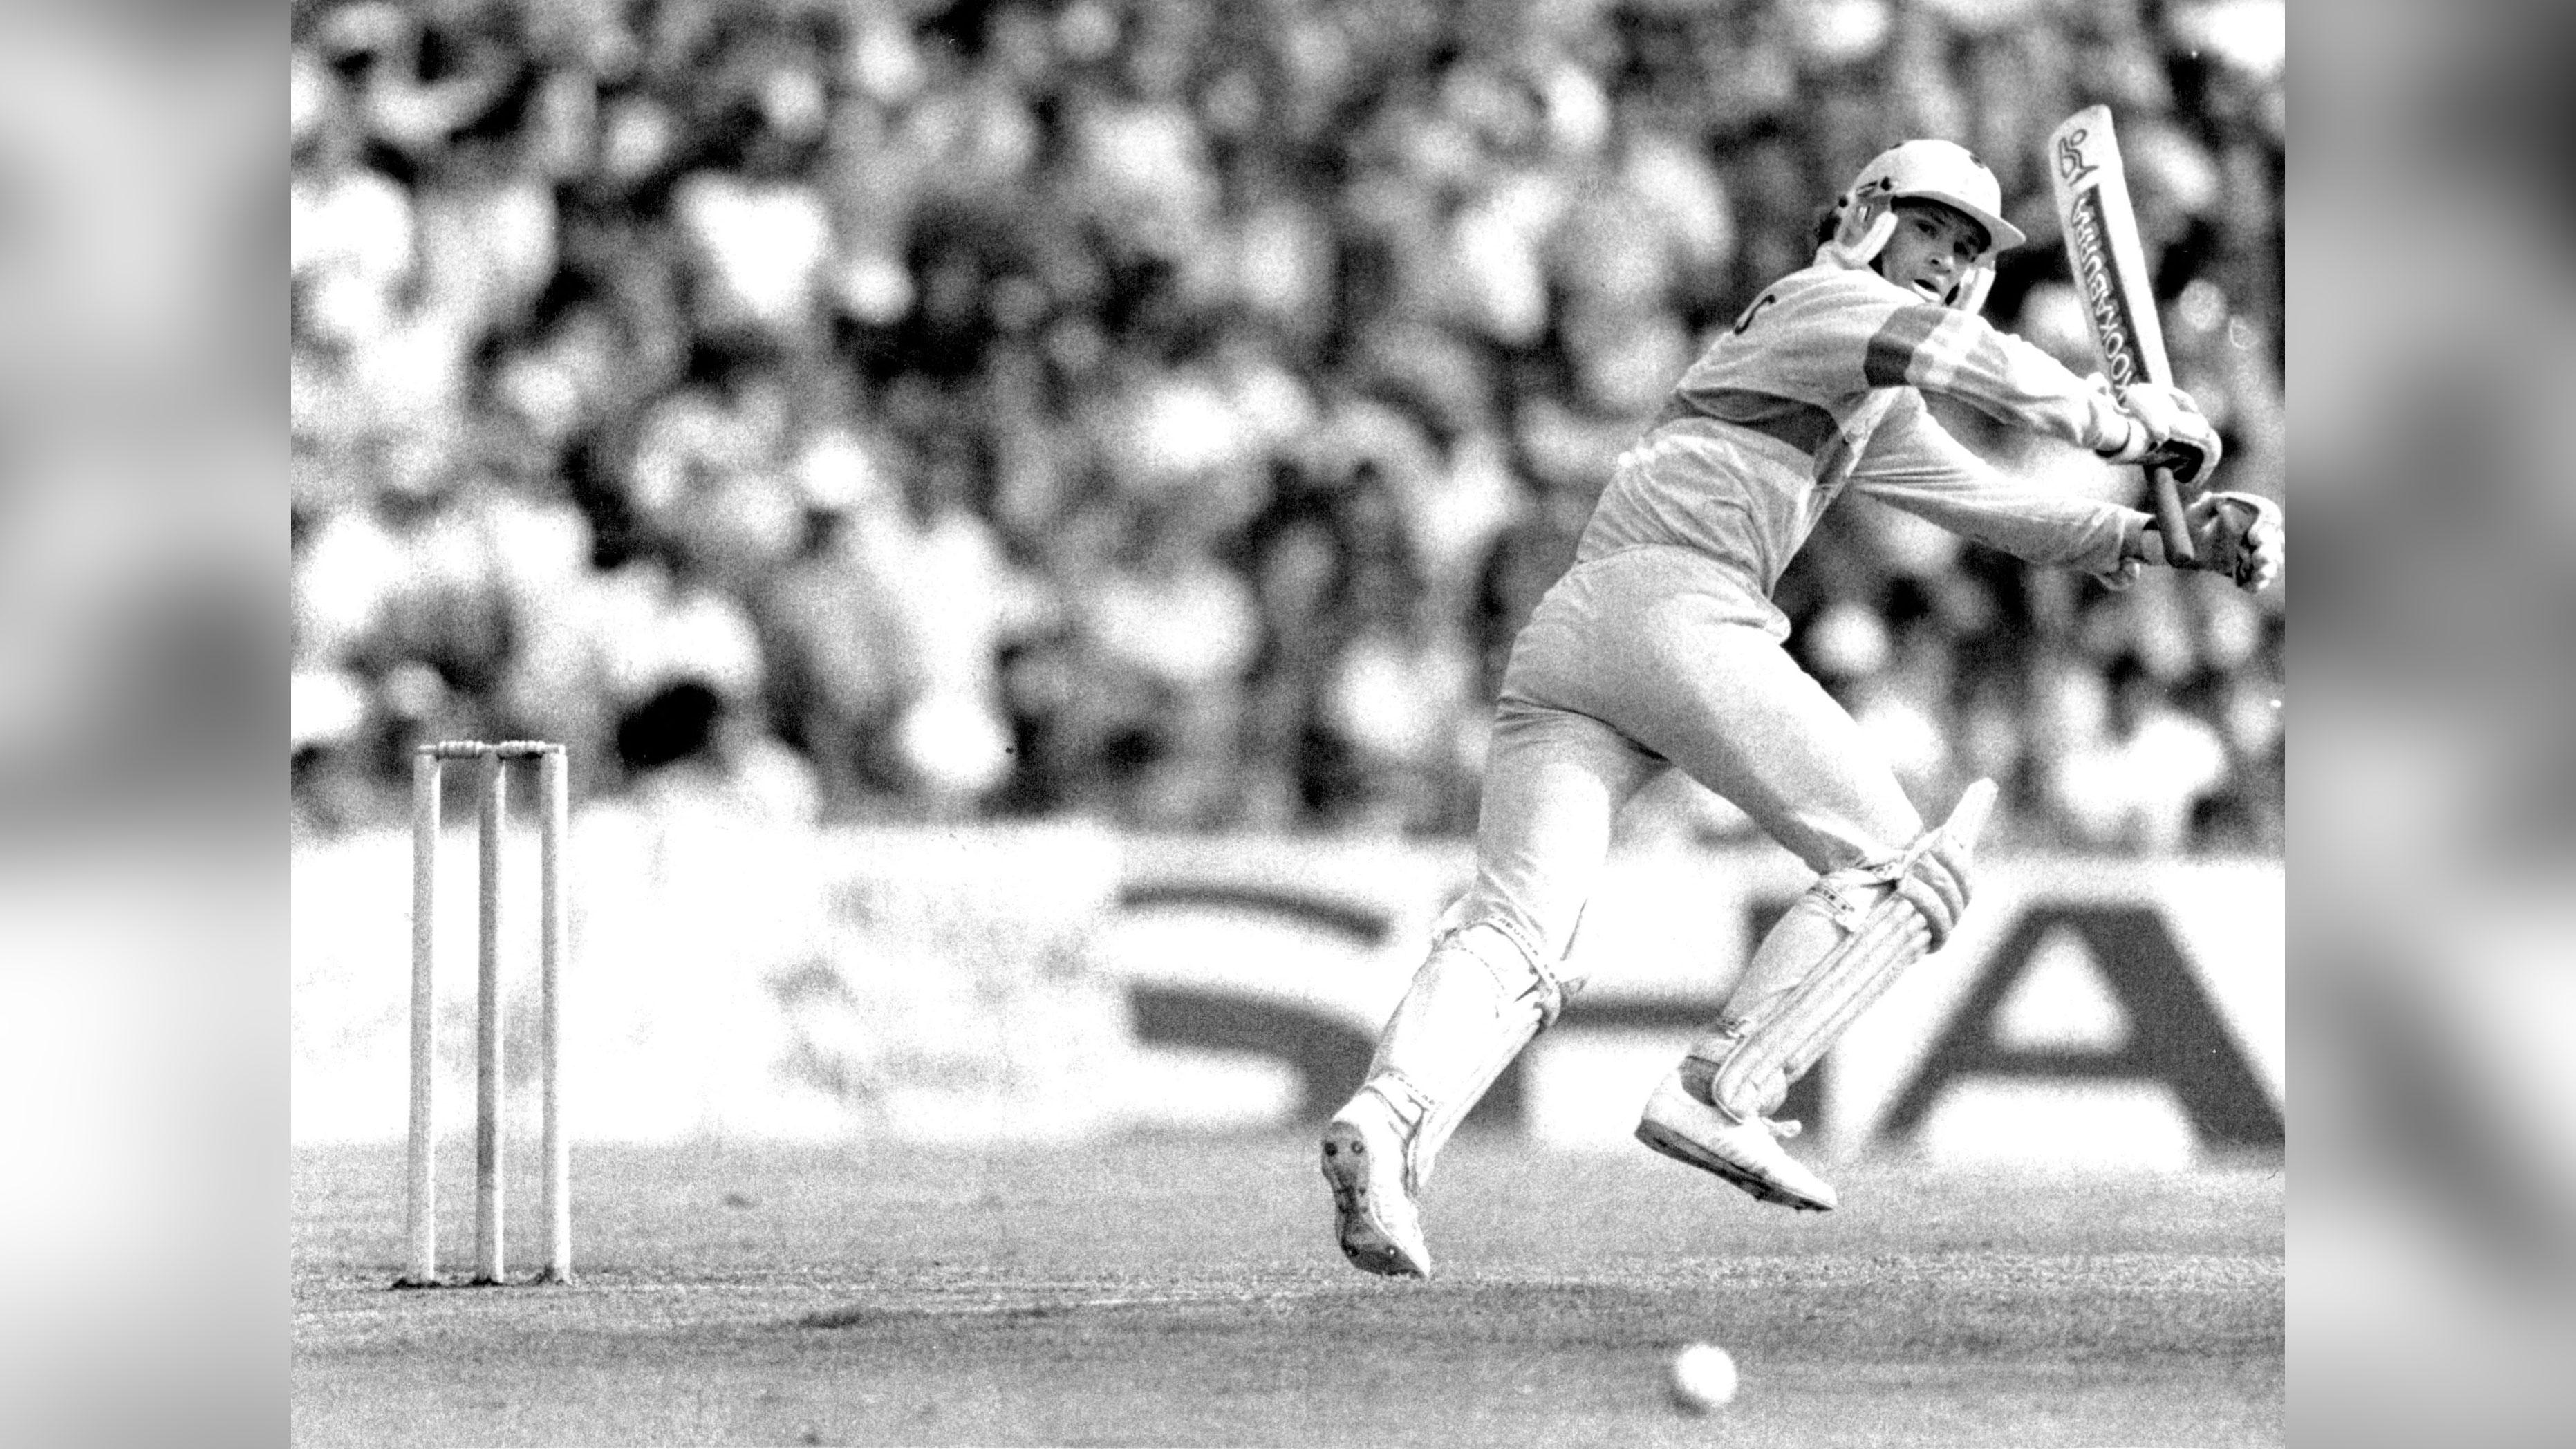 Australian Cricket Legend Dean Jones Dies Aged 59 Kugn 590 Kugn Am